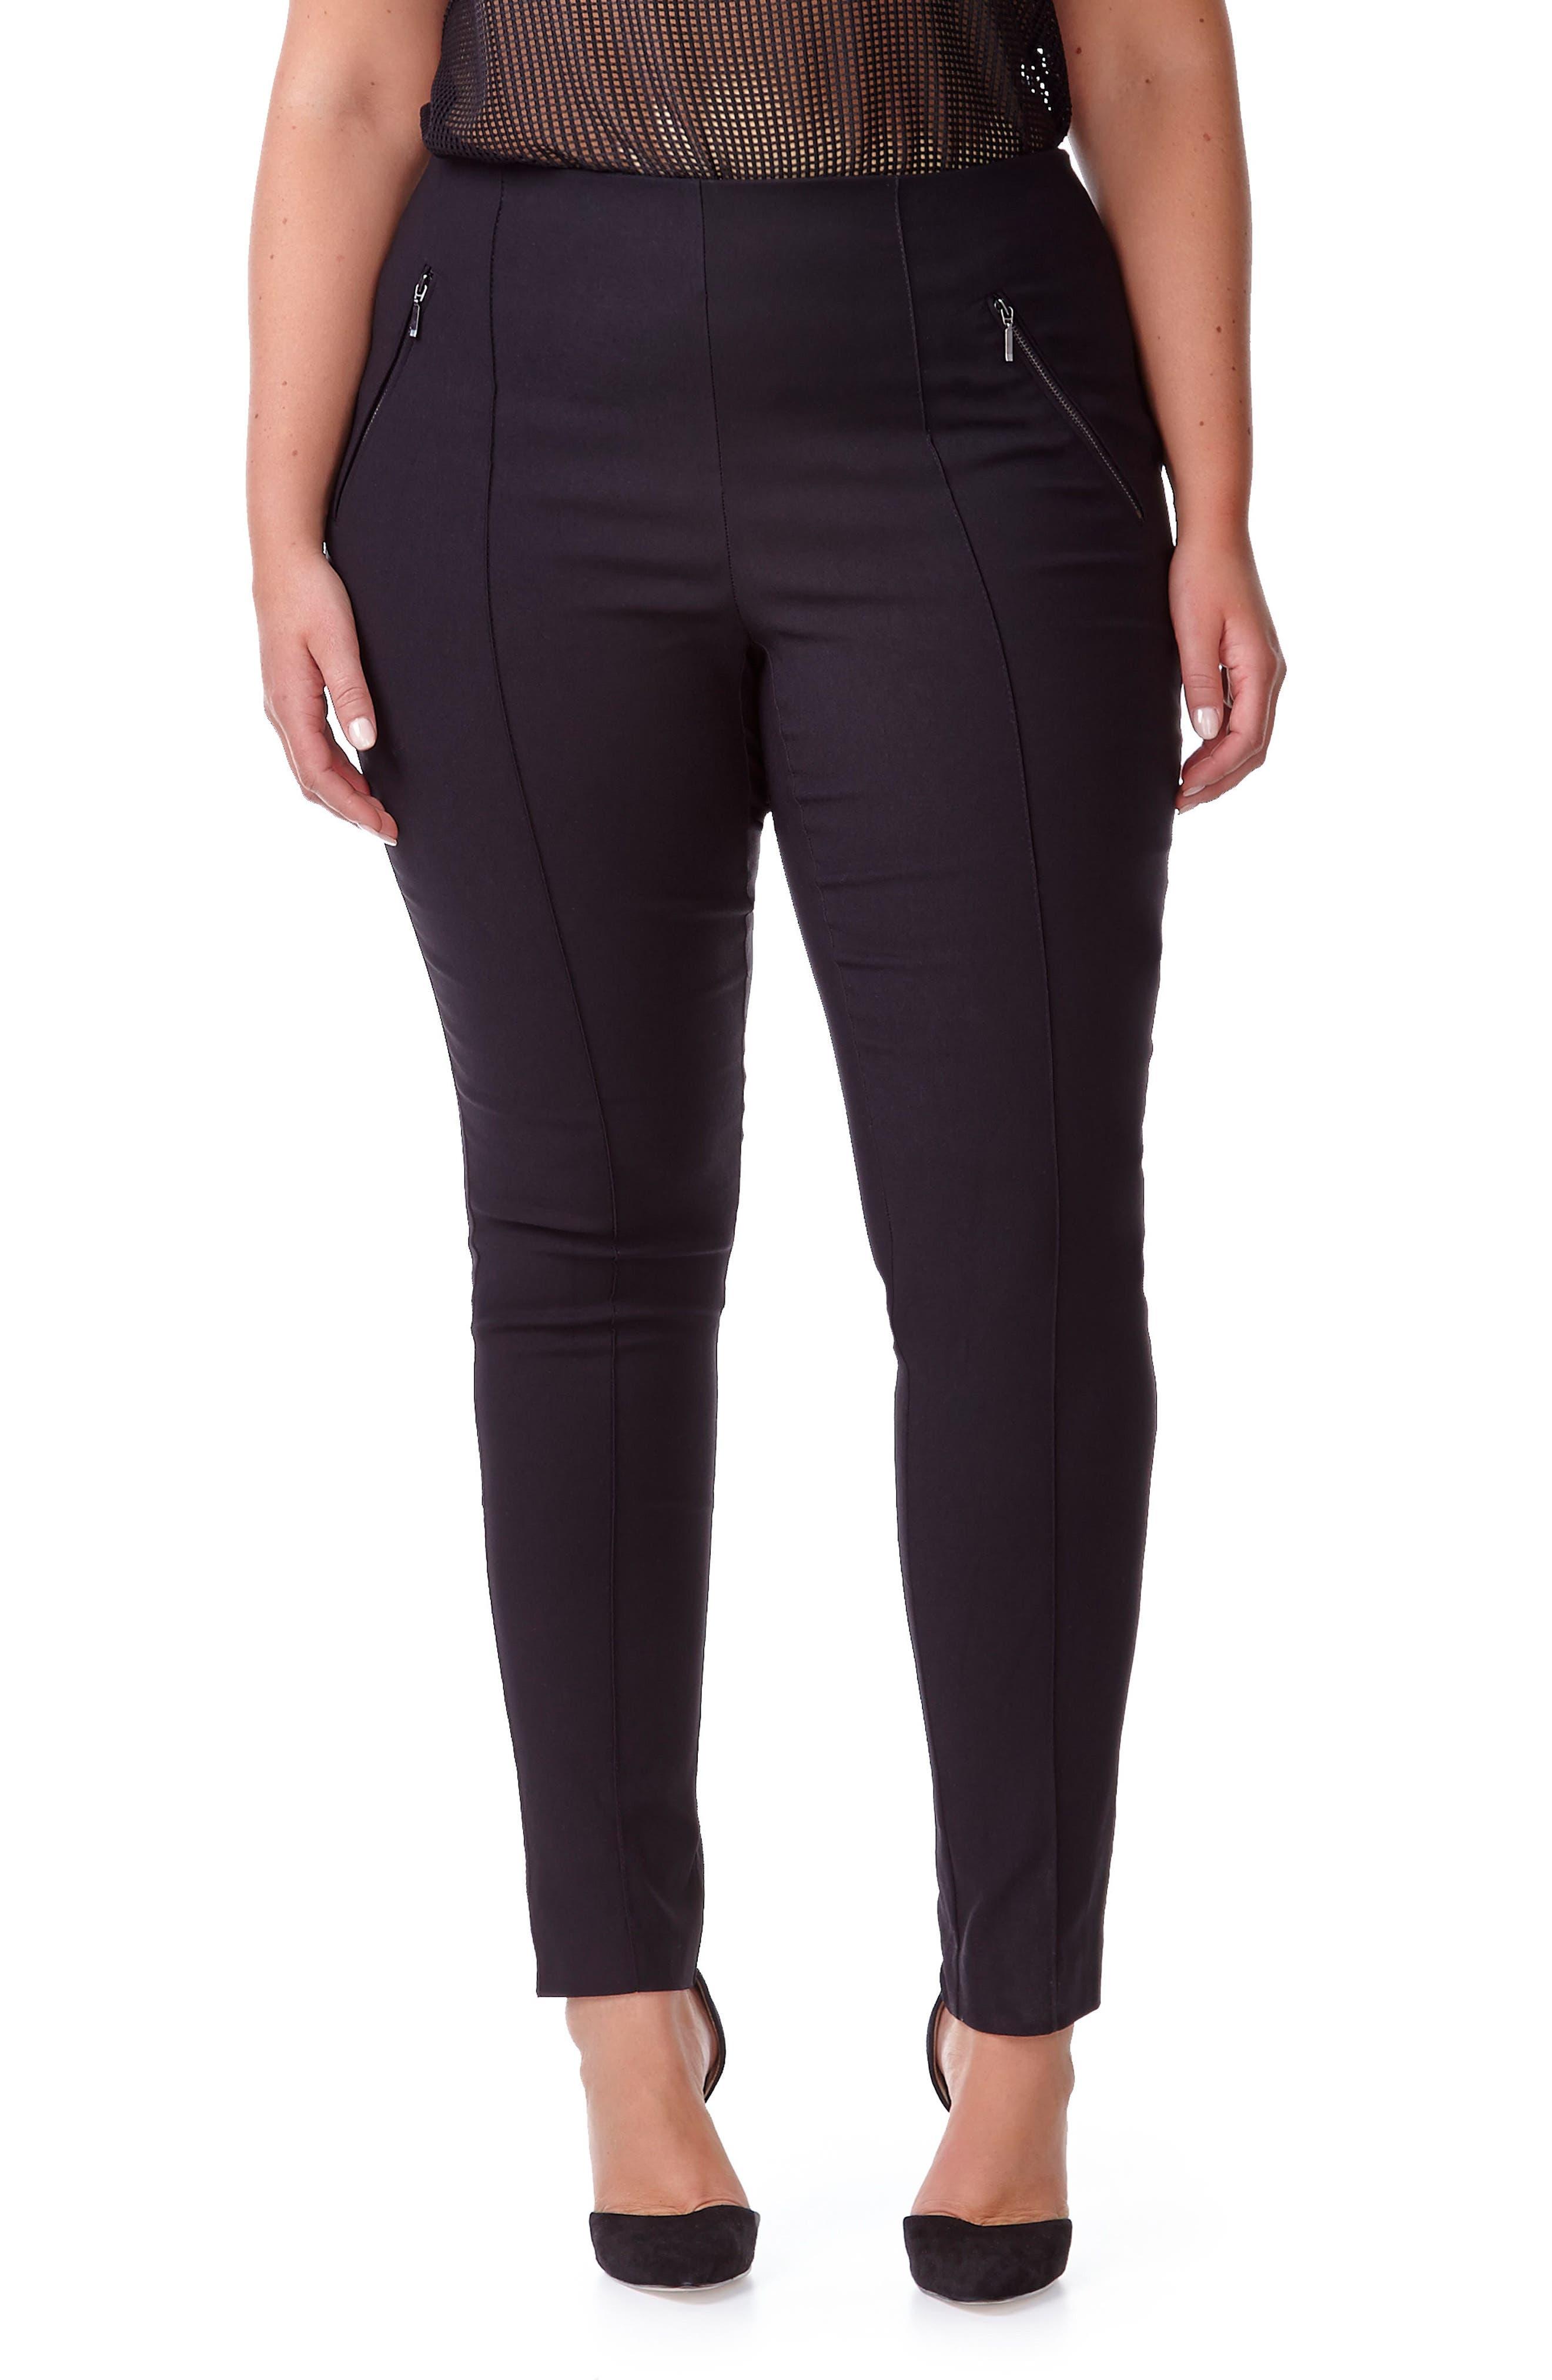 MICHEL STUDIO Alexa Ankle Pants, Main, color, BLACK